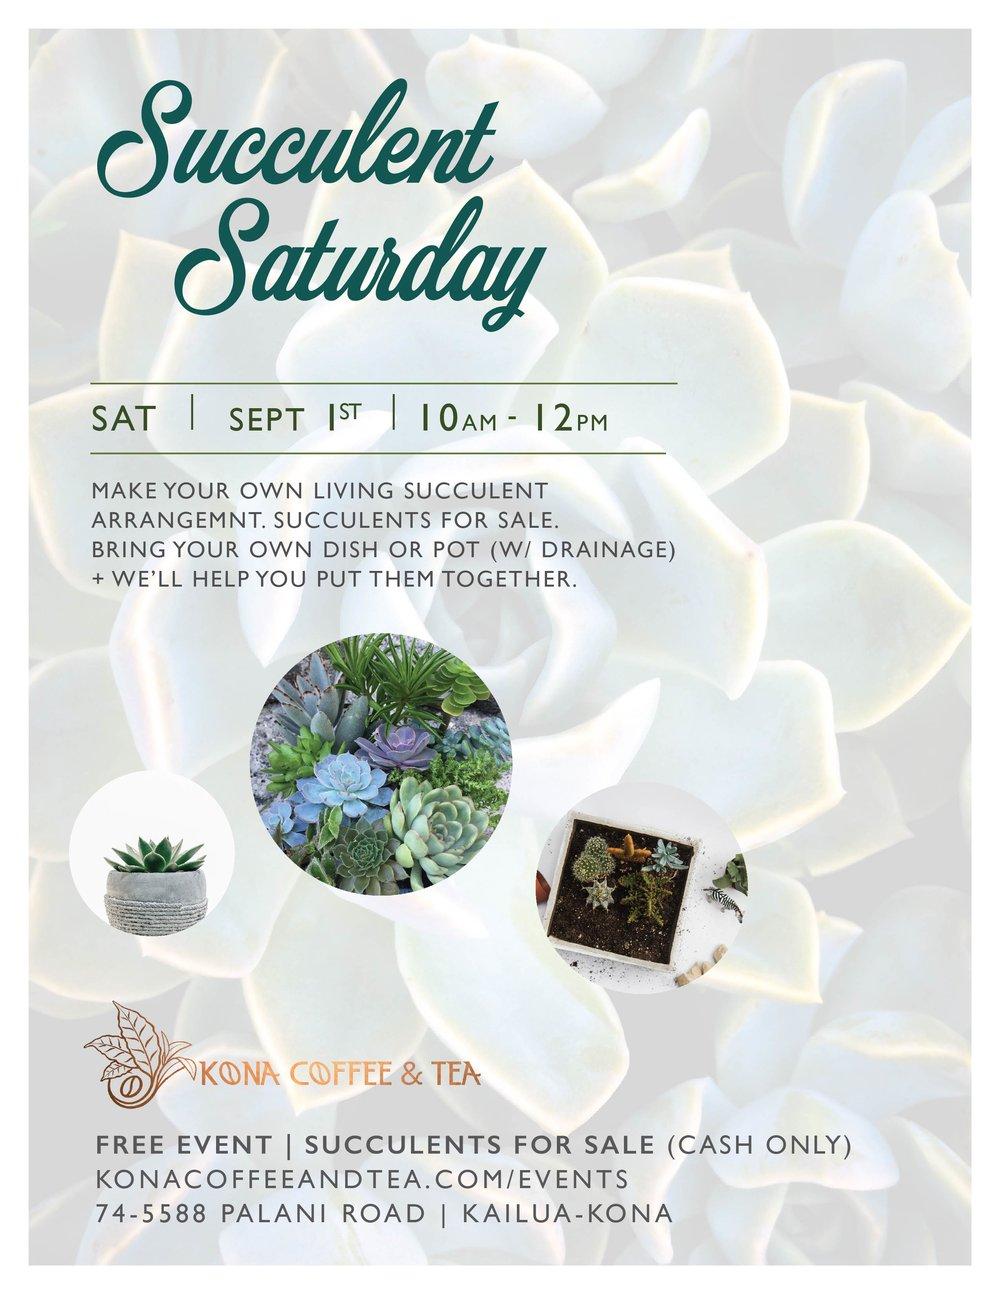 Succulent Saturday_9.1.18_Kona Coffee and Tea-01.jpg